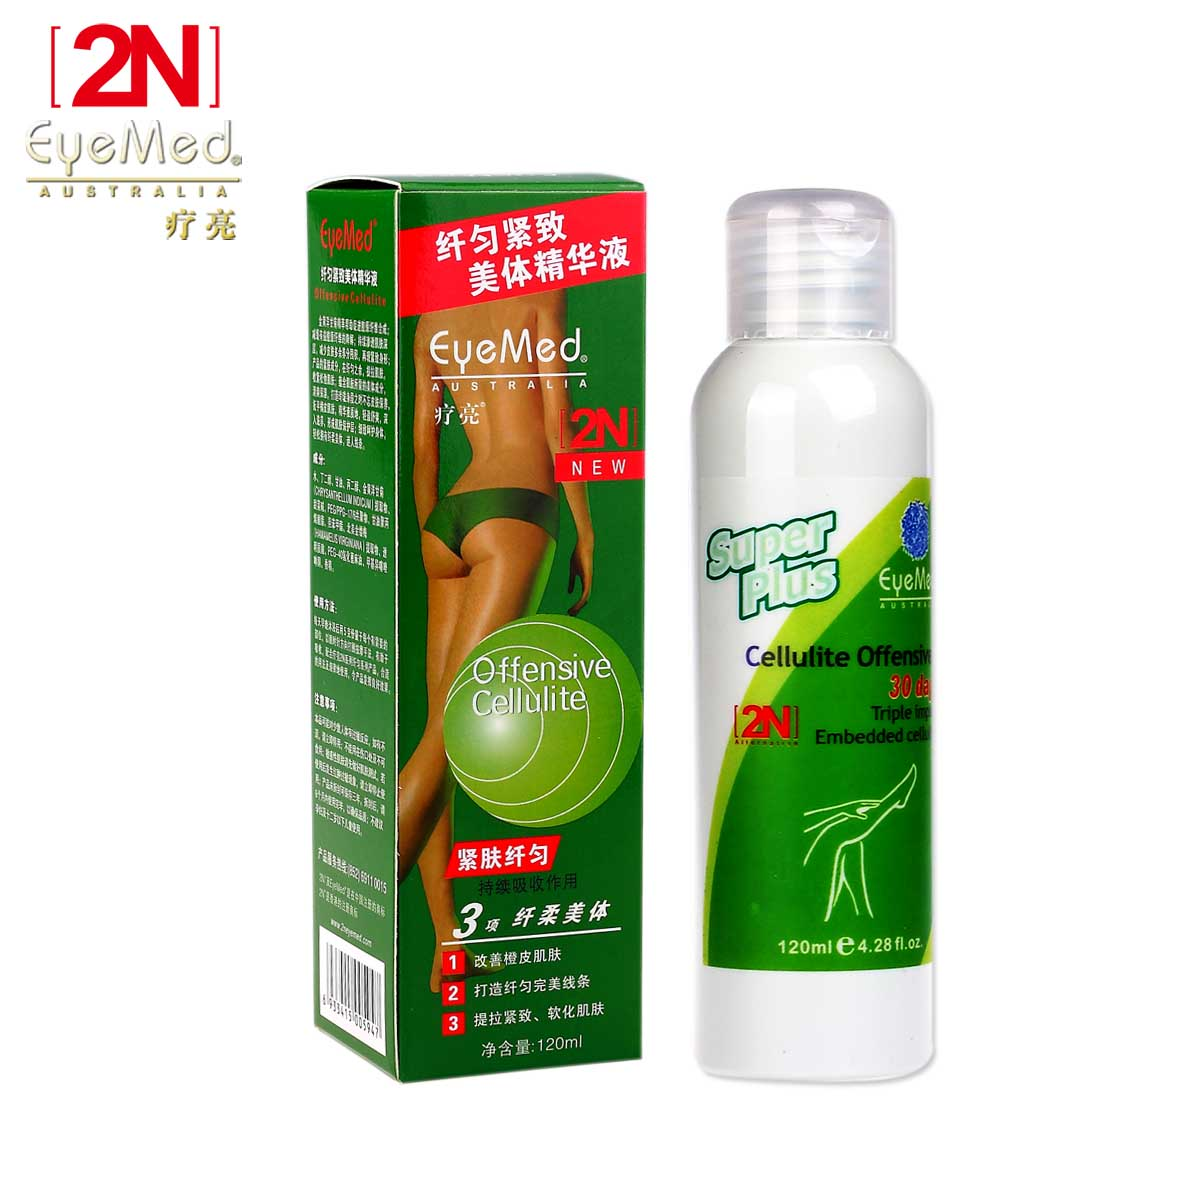 2N EyeMed Anti Cellulite Cream Effect Women Body Slimming ...